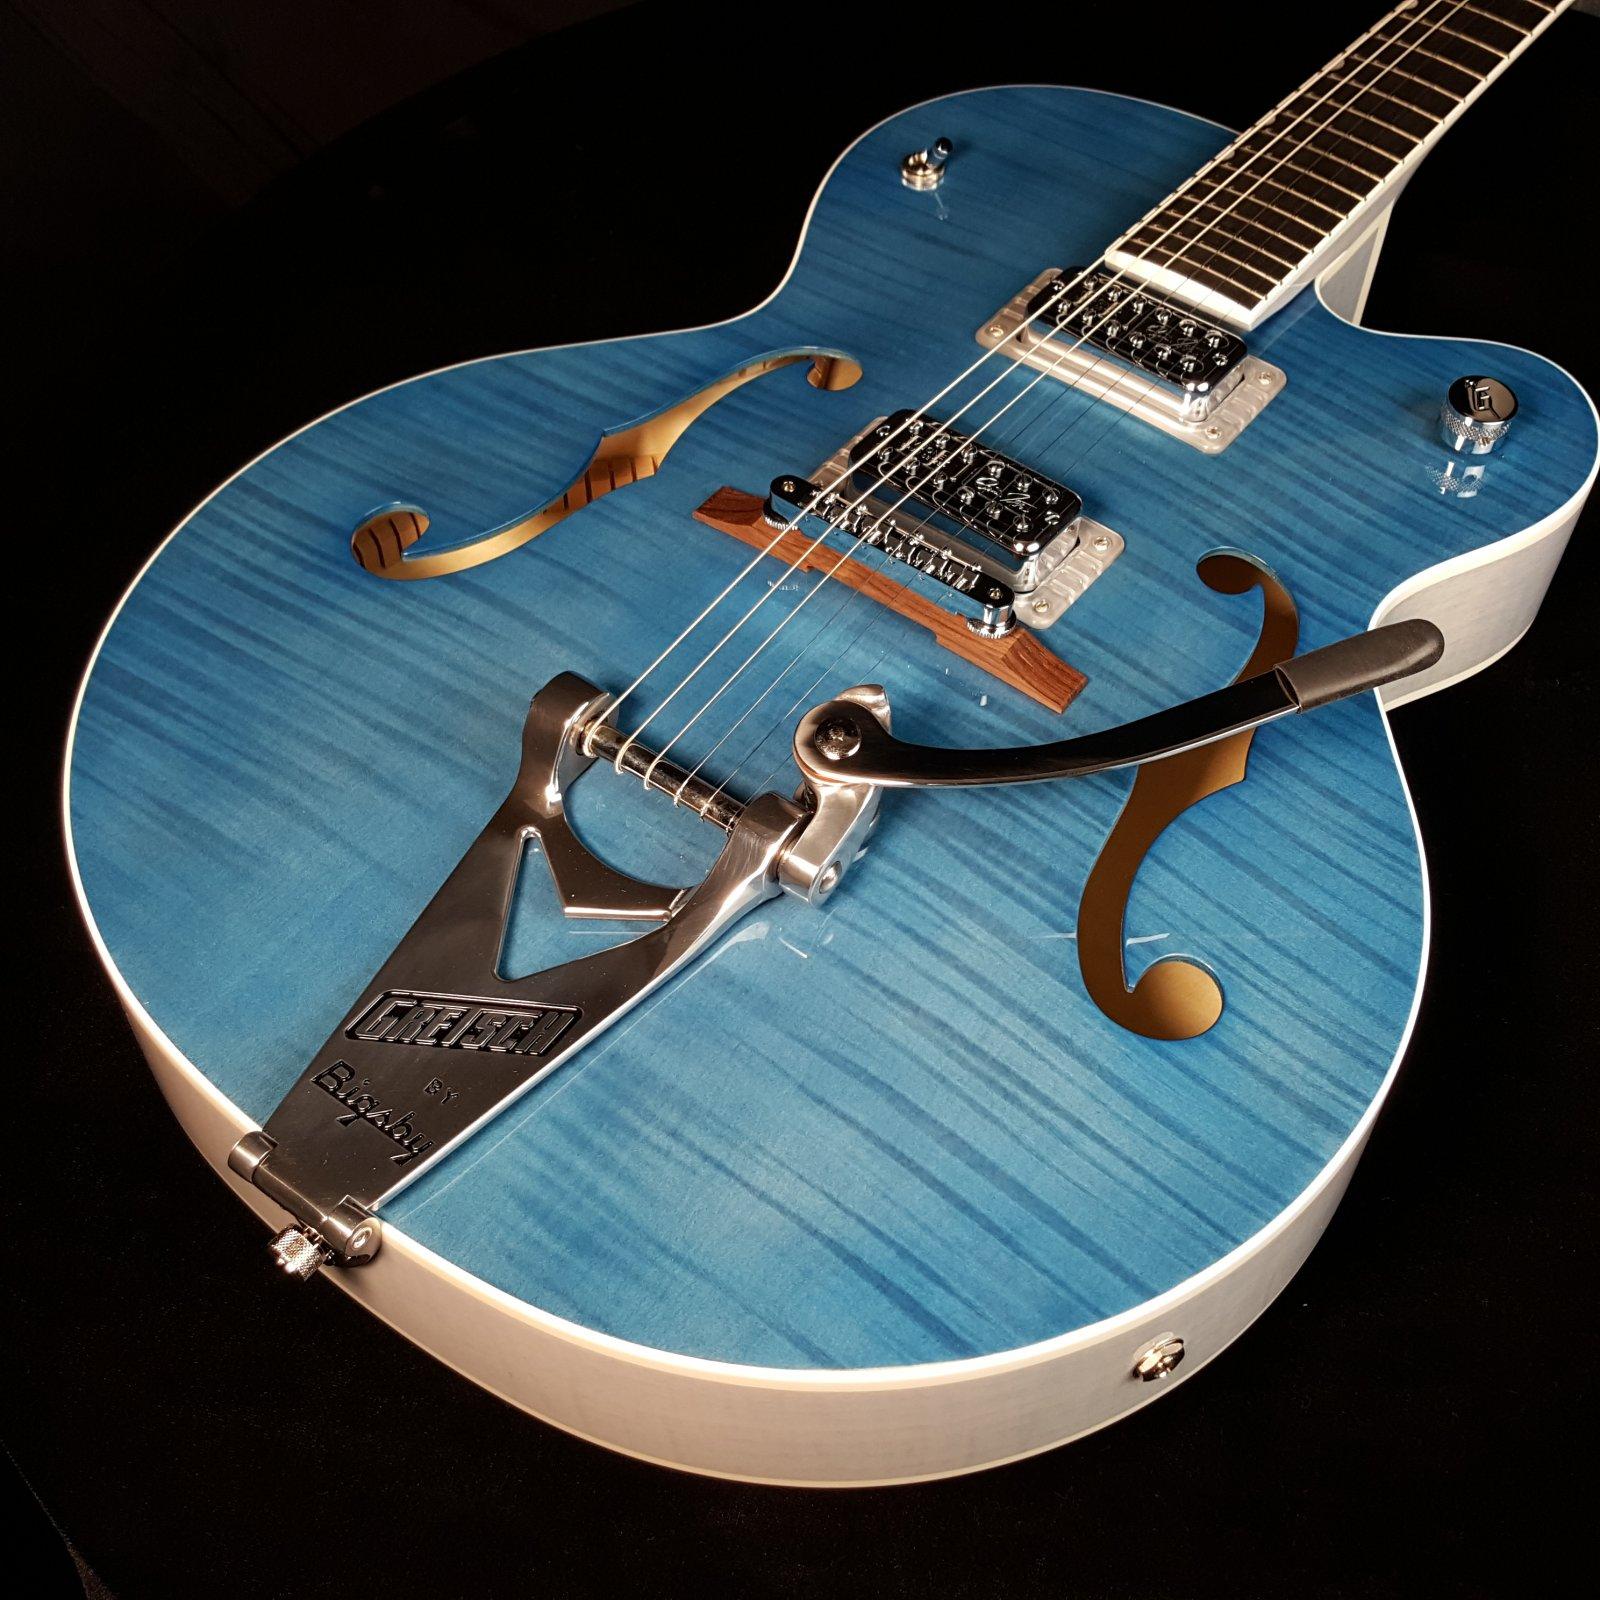 Gretsch G6120SH Brian Setzer Hot Rod Ebony Harbor Blue